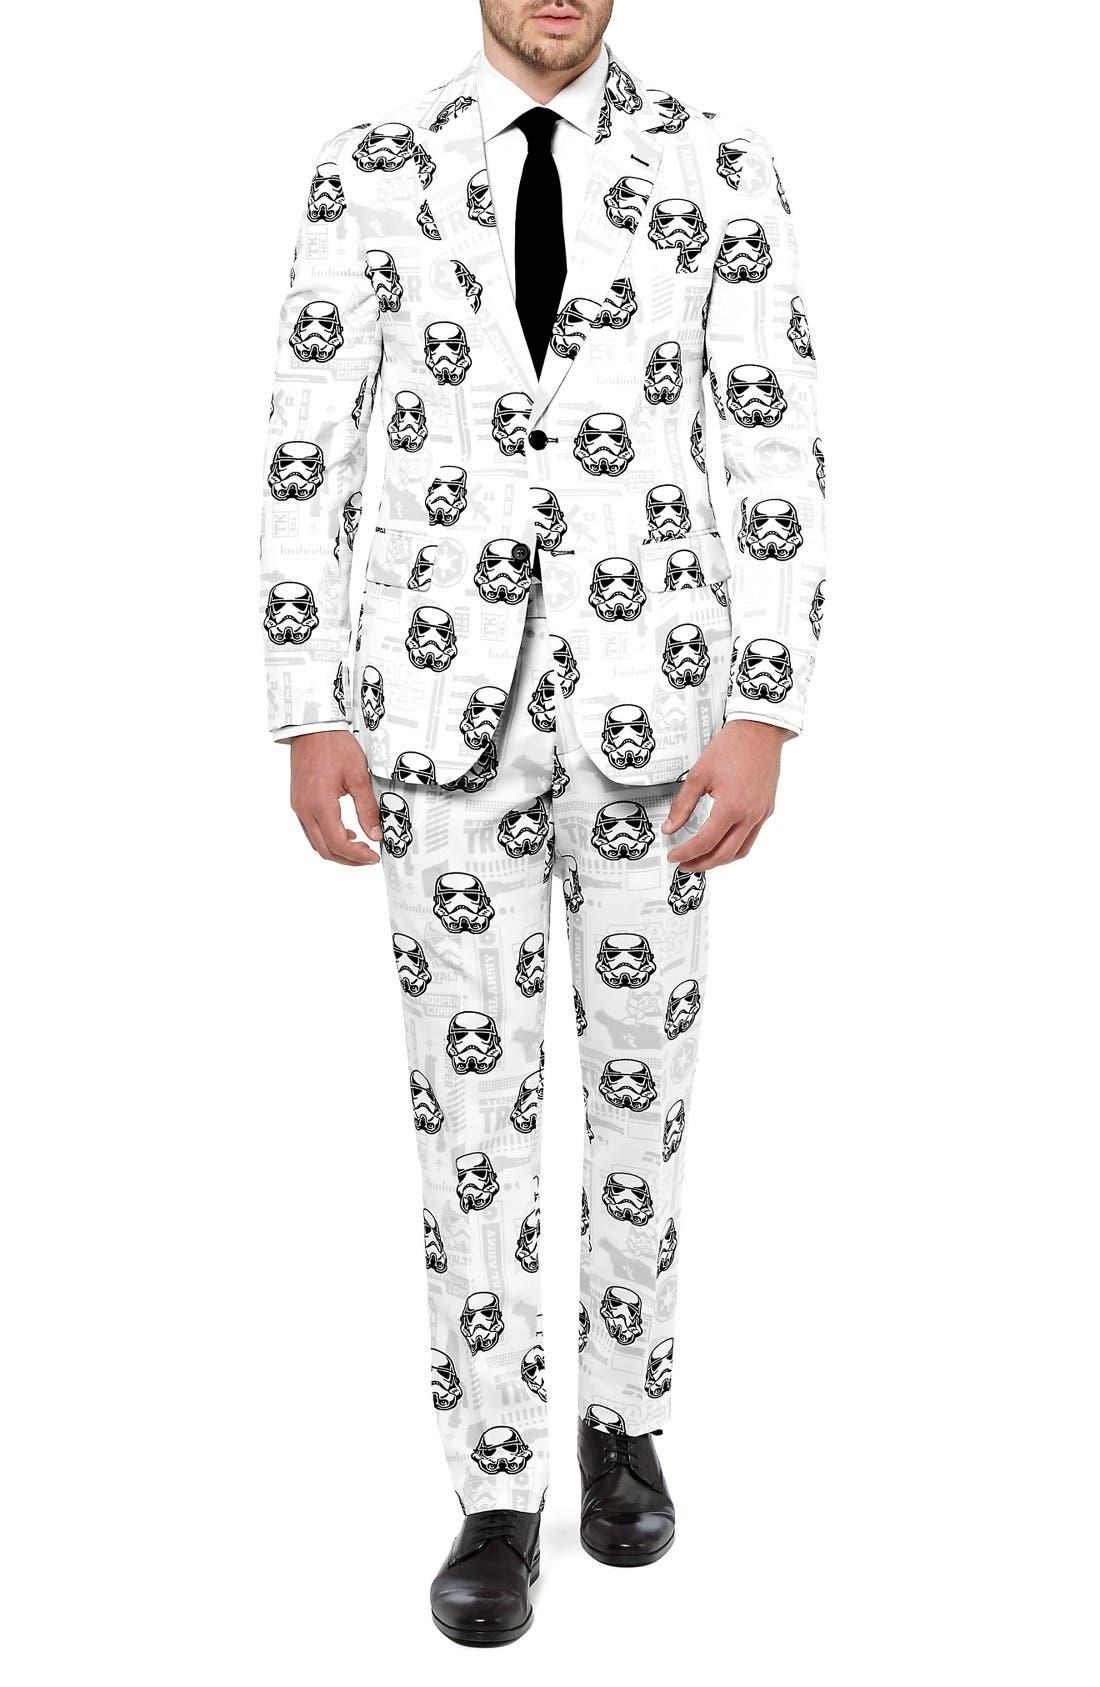 Stormtrooper Trim Fit Two-Piece Suit with Tie,                             Main thumbnail 1, color,                             White/ Multi